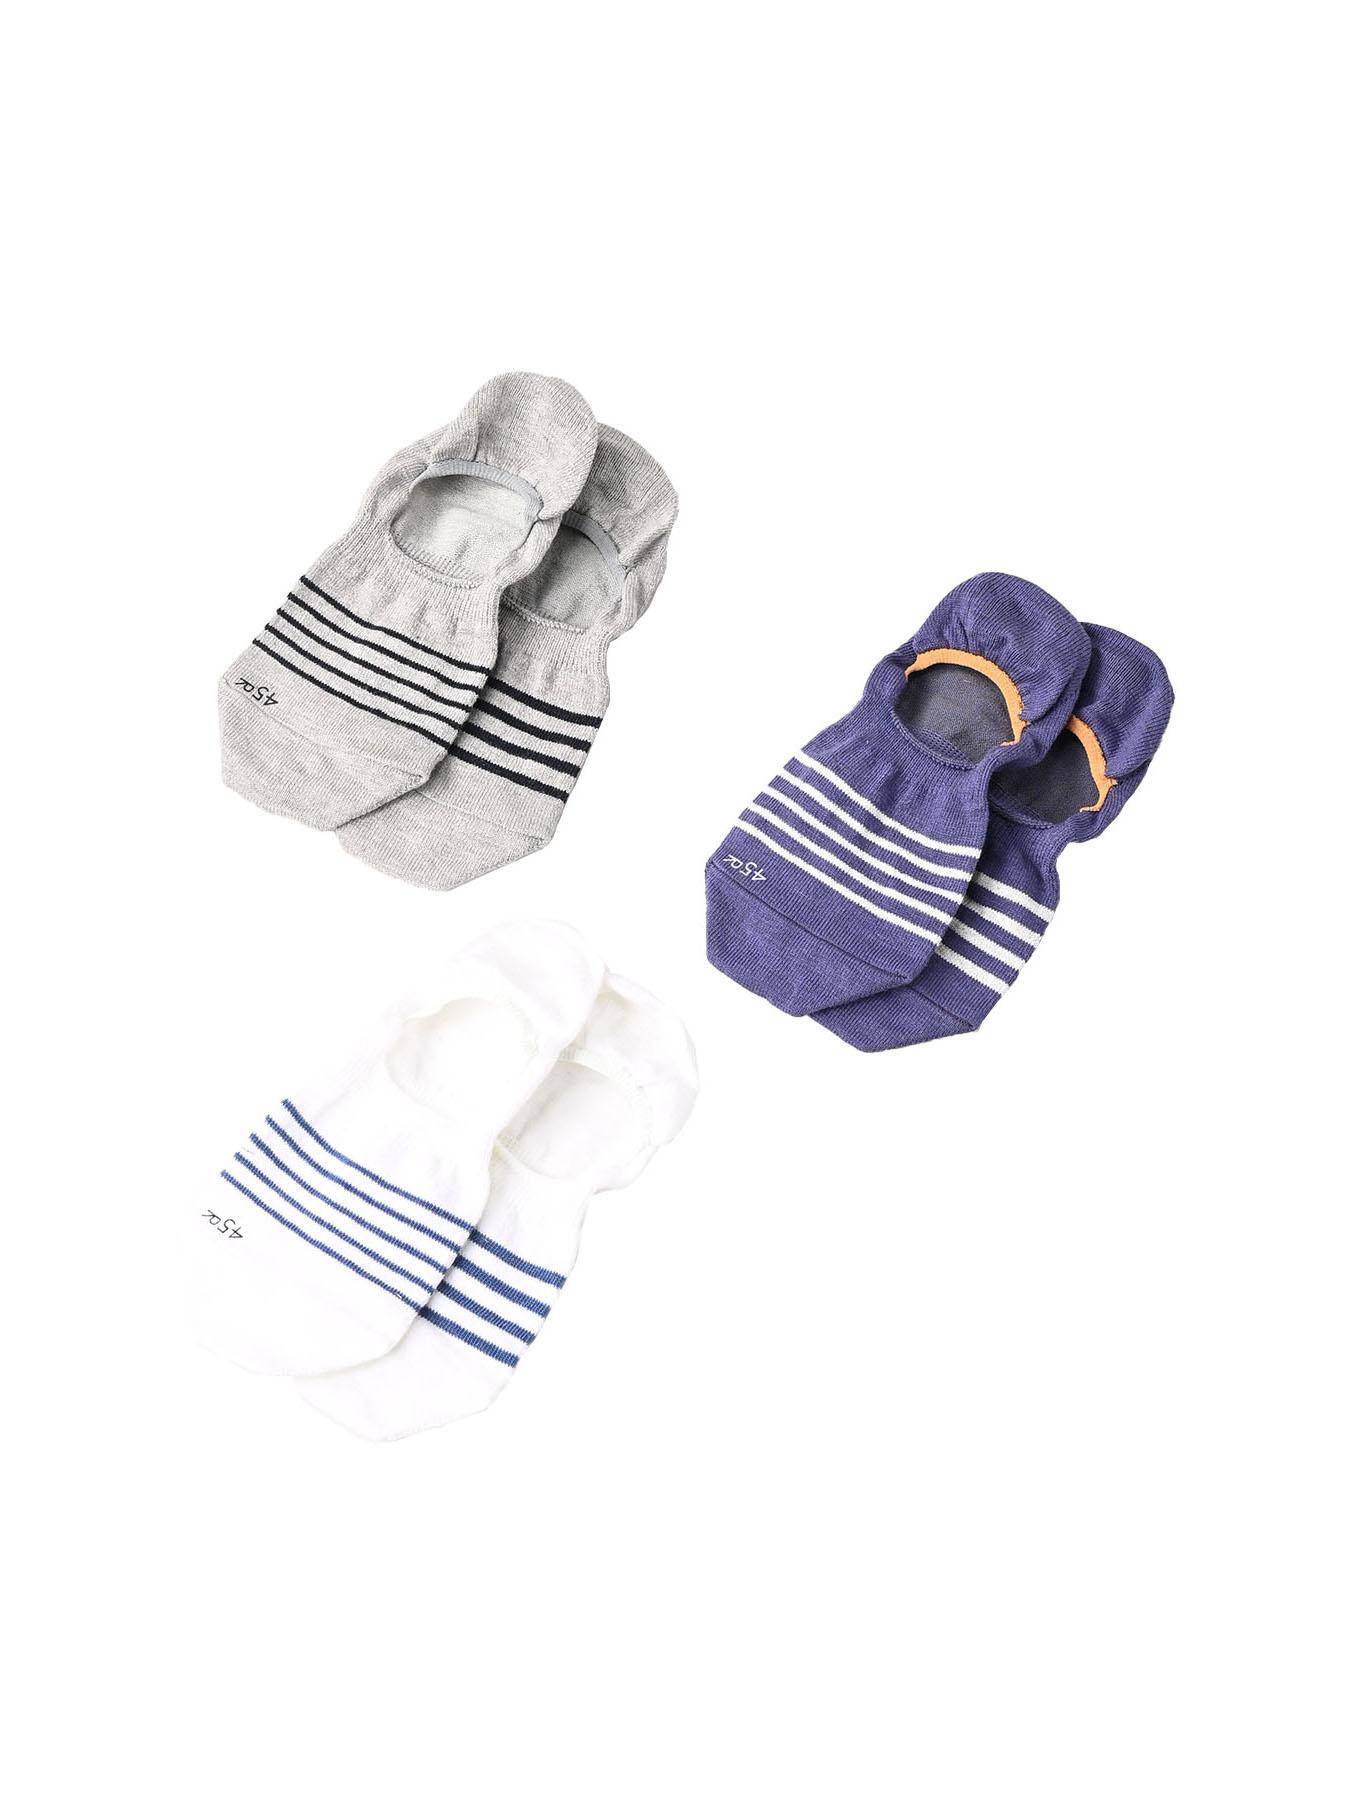 Basque Border Sole Socks (0321)-2